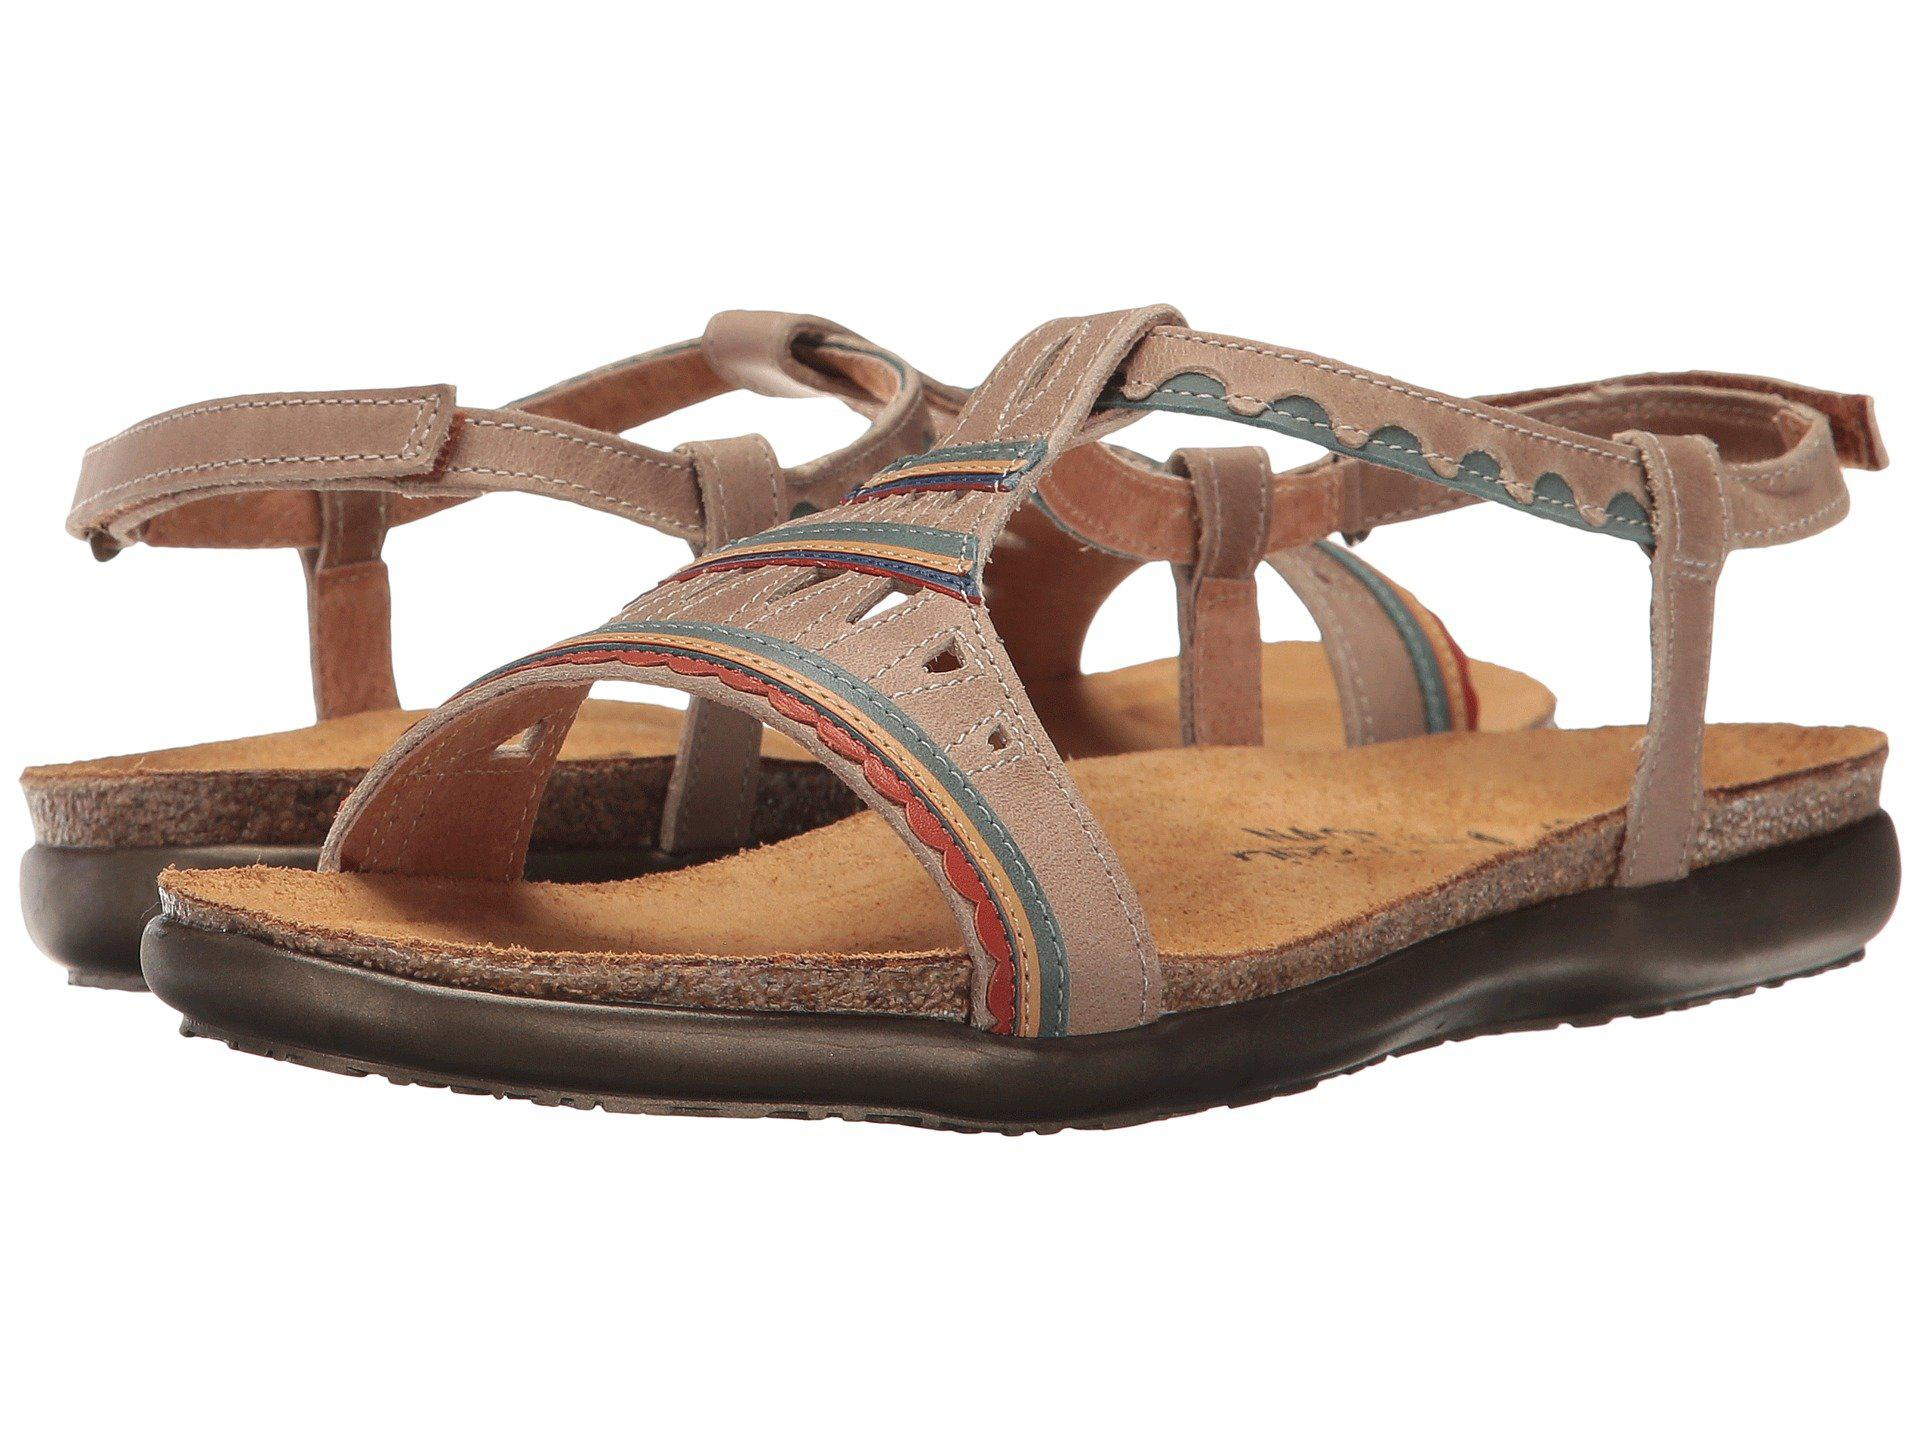 Odelia Leather Sandals 8NyknY5S